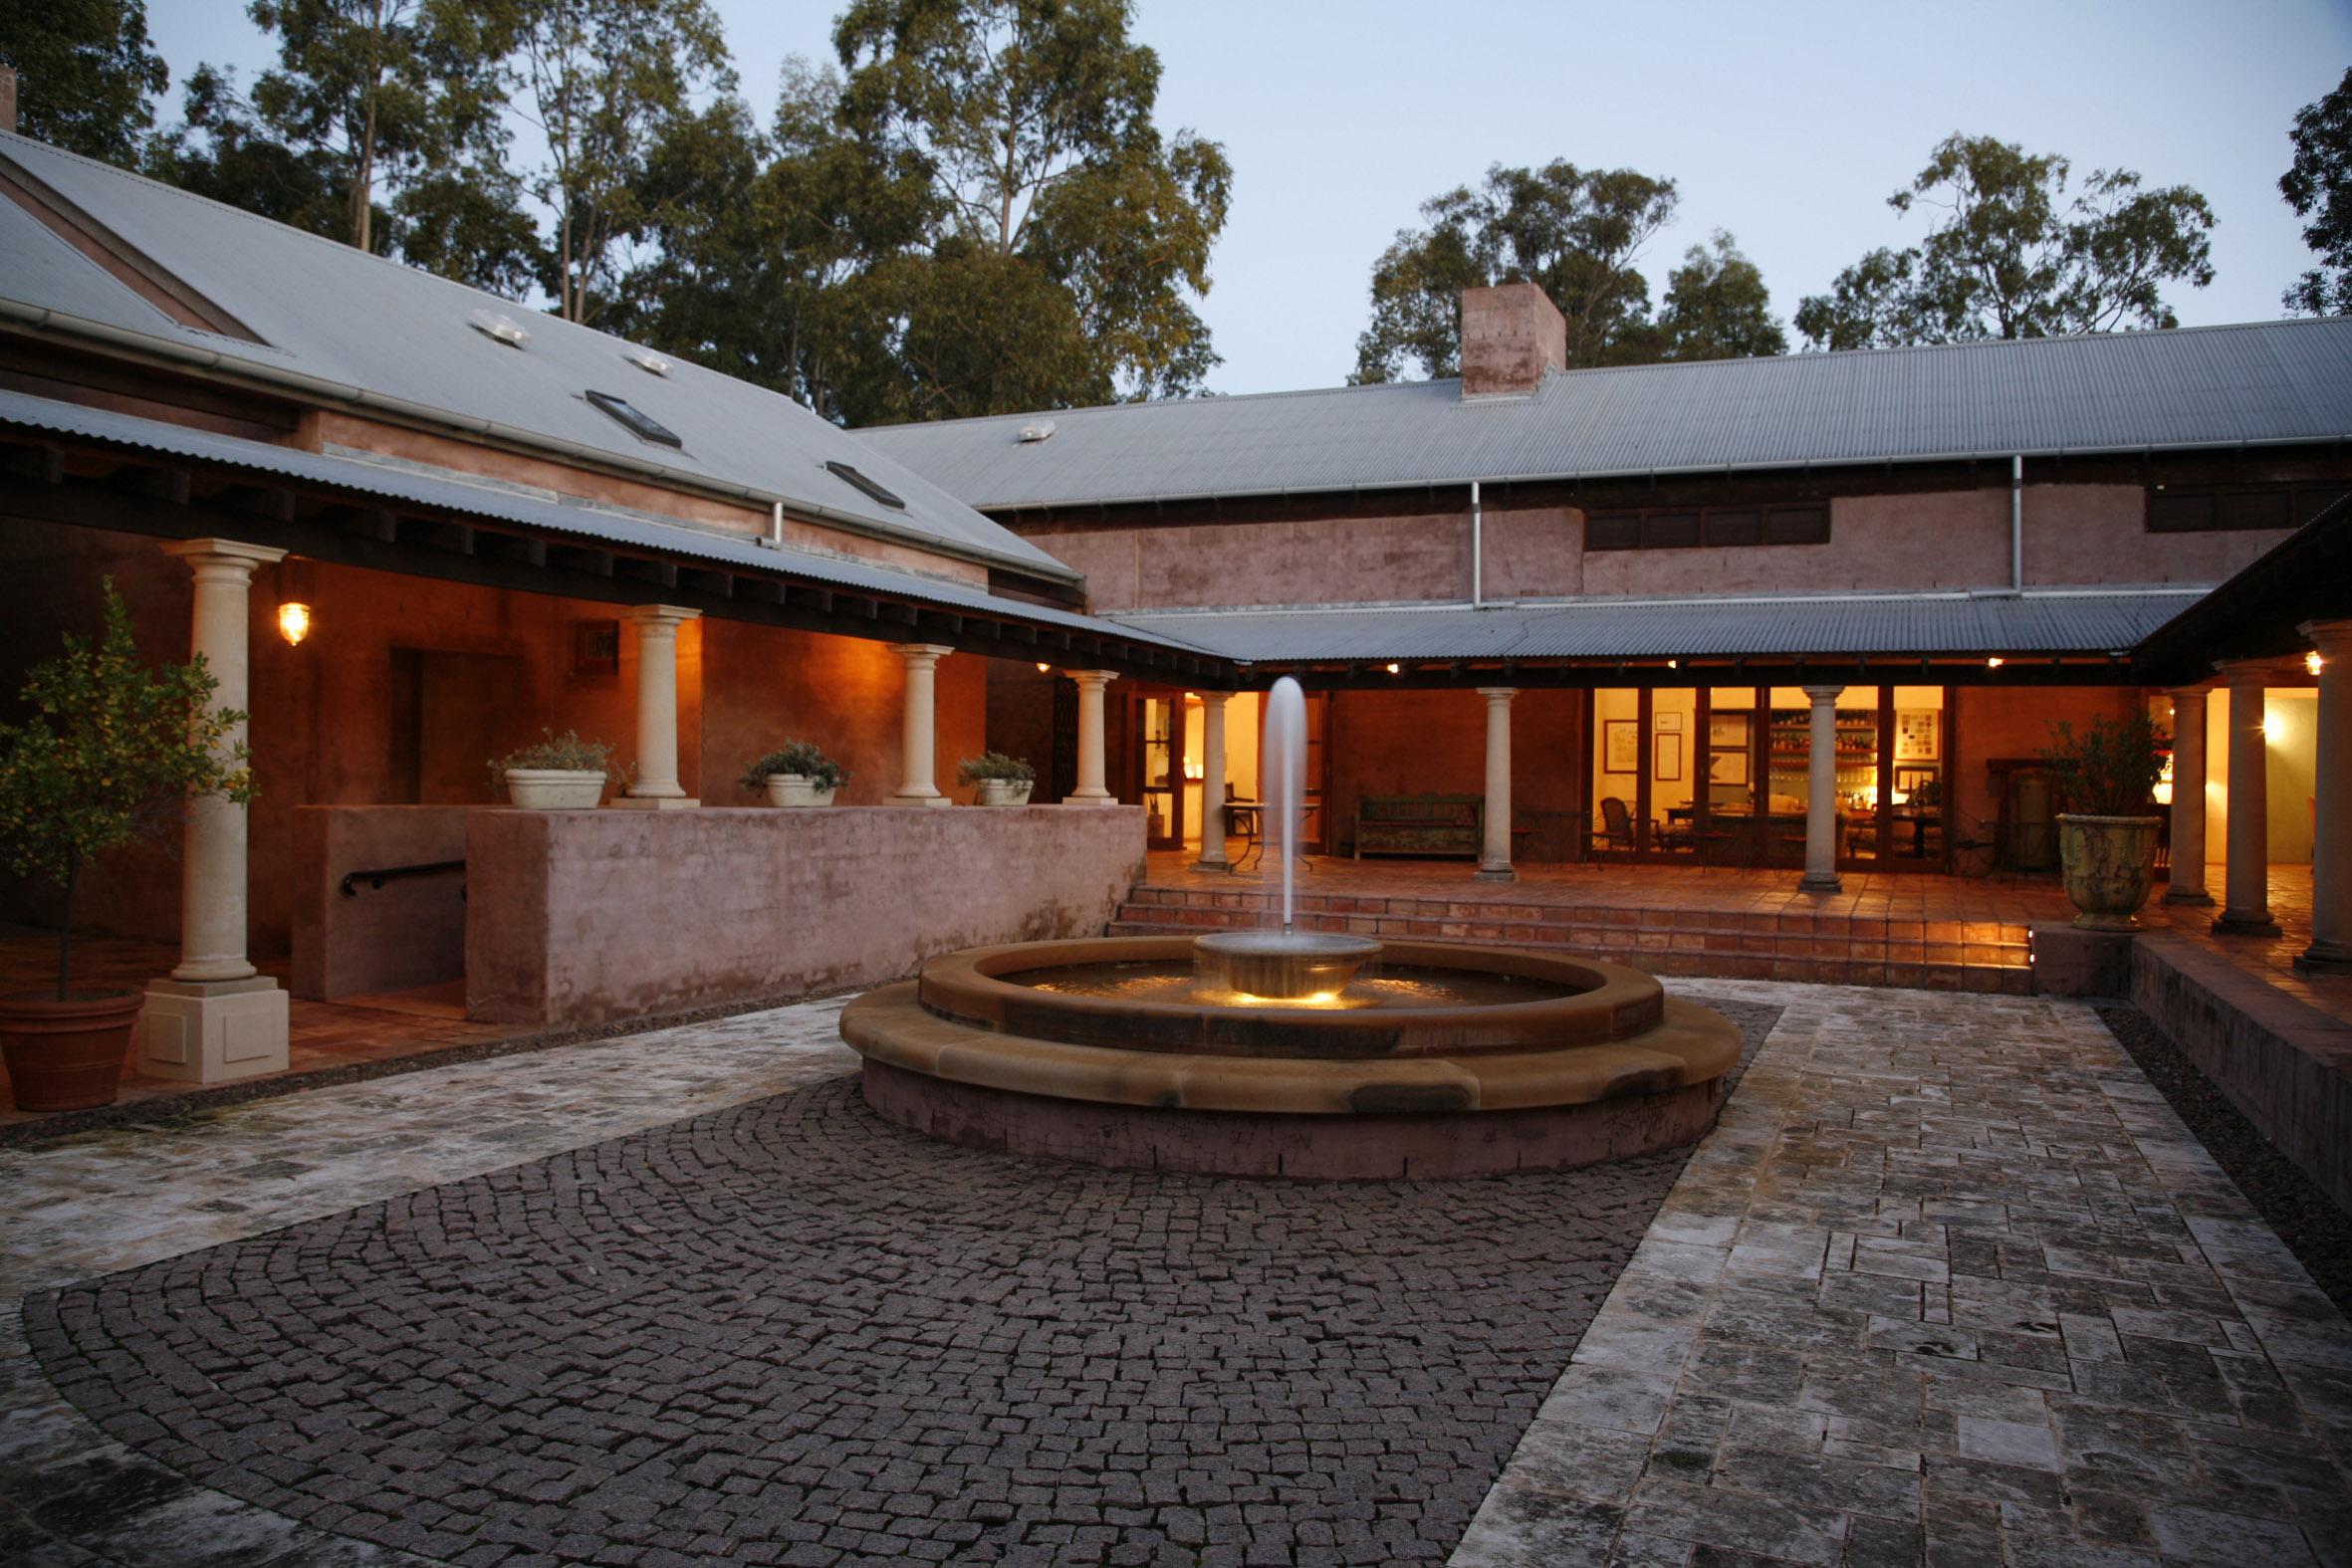 Tower Lodge - Courtyard.jpg